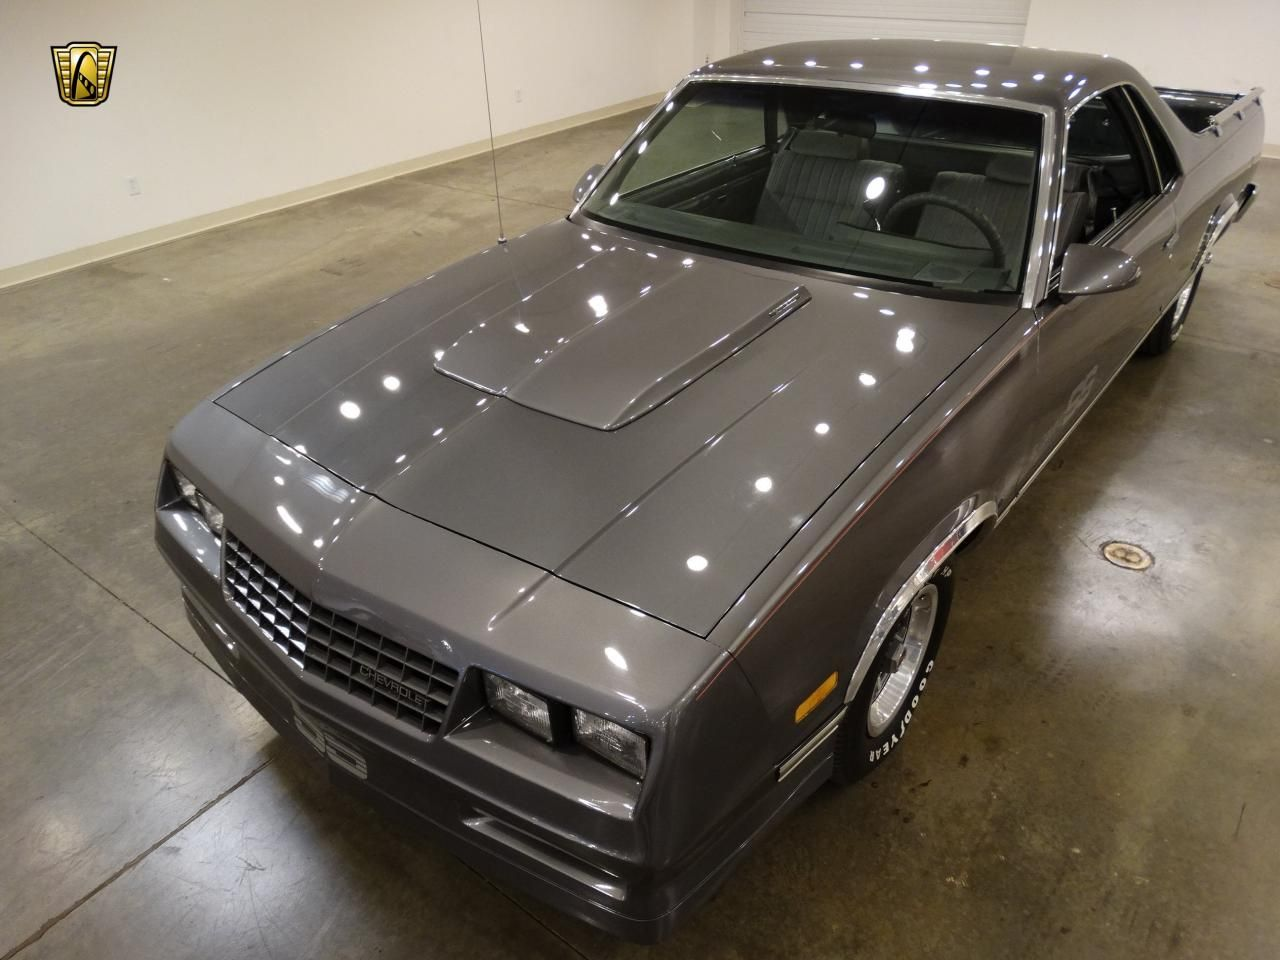 1986 Chevrolet El Camino Choo Choo Customs 5 0l V8 4bl Ohv 3a For